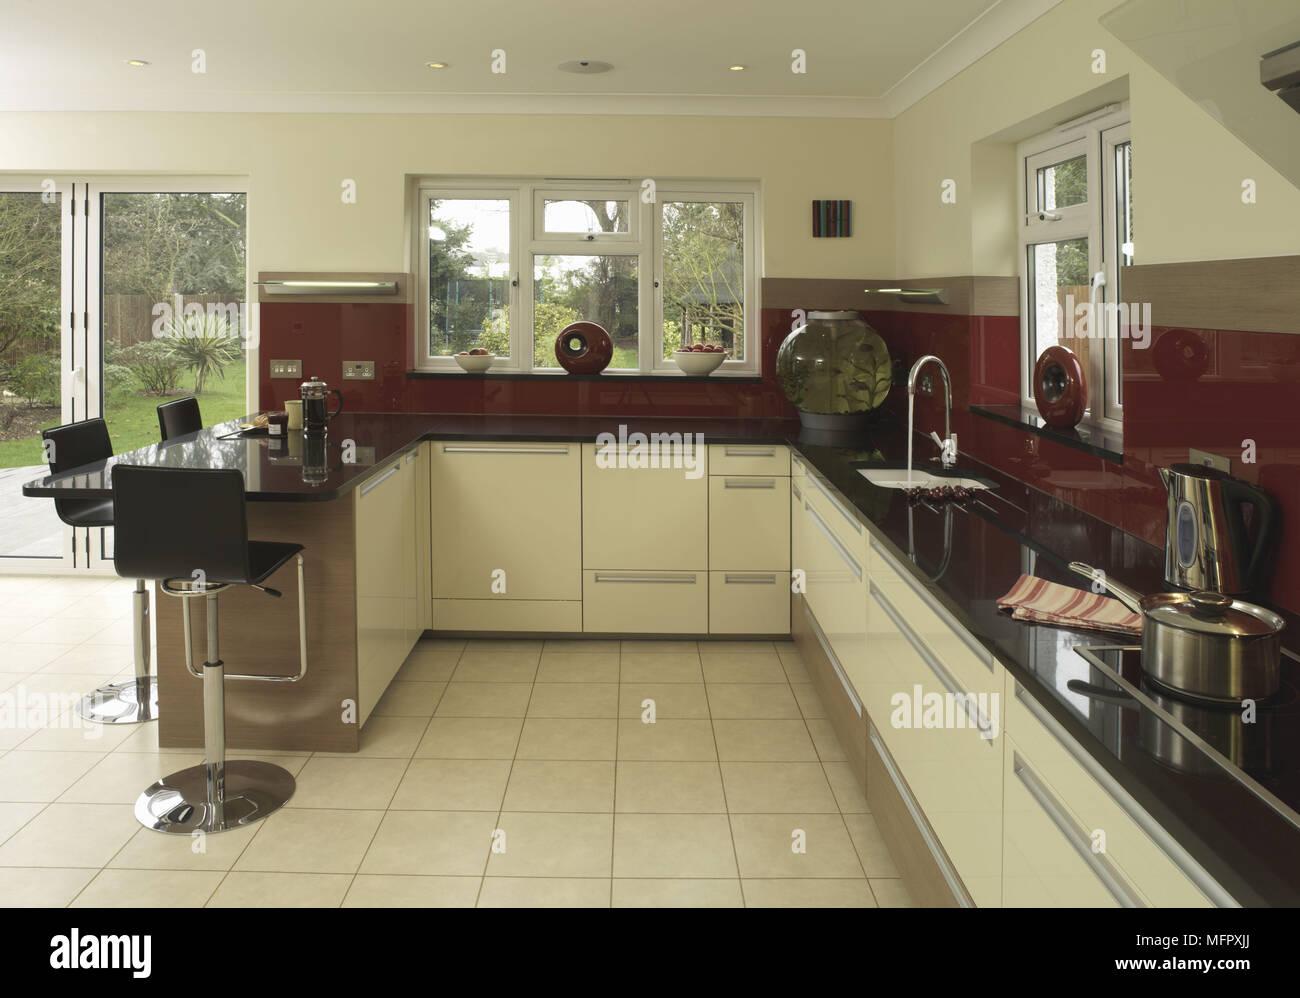 Bar stools at peninsula breakfast bar unit in modern kitchen Stock ...